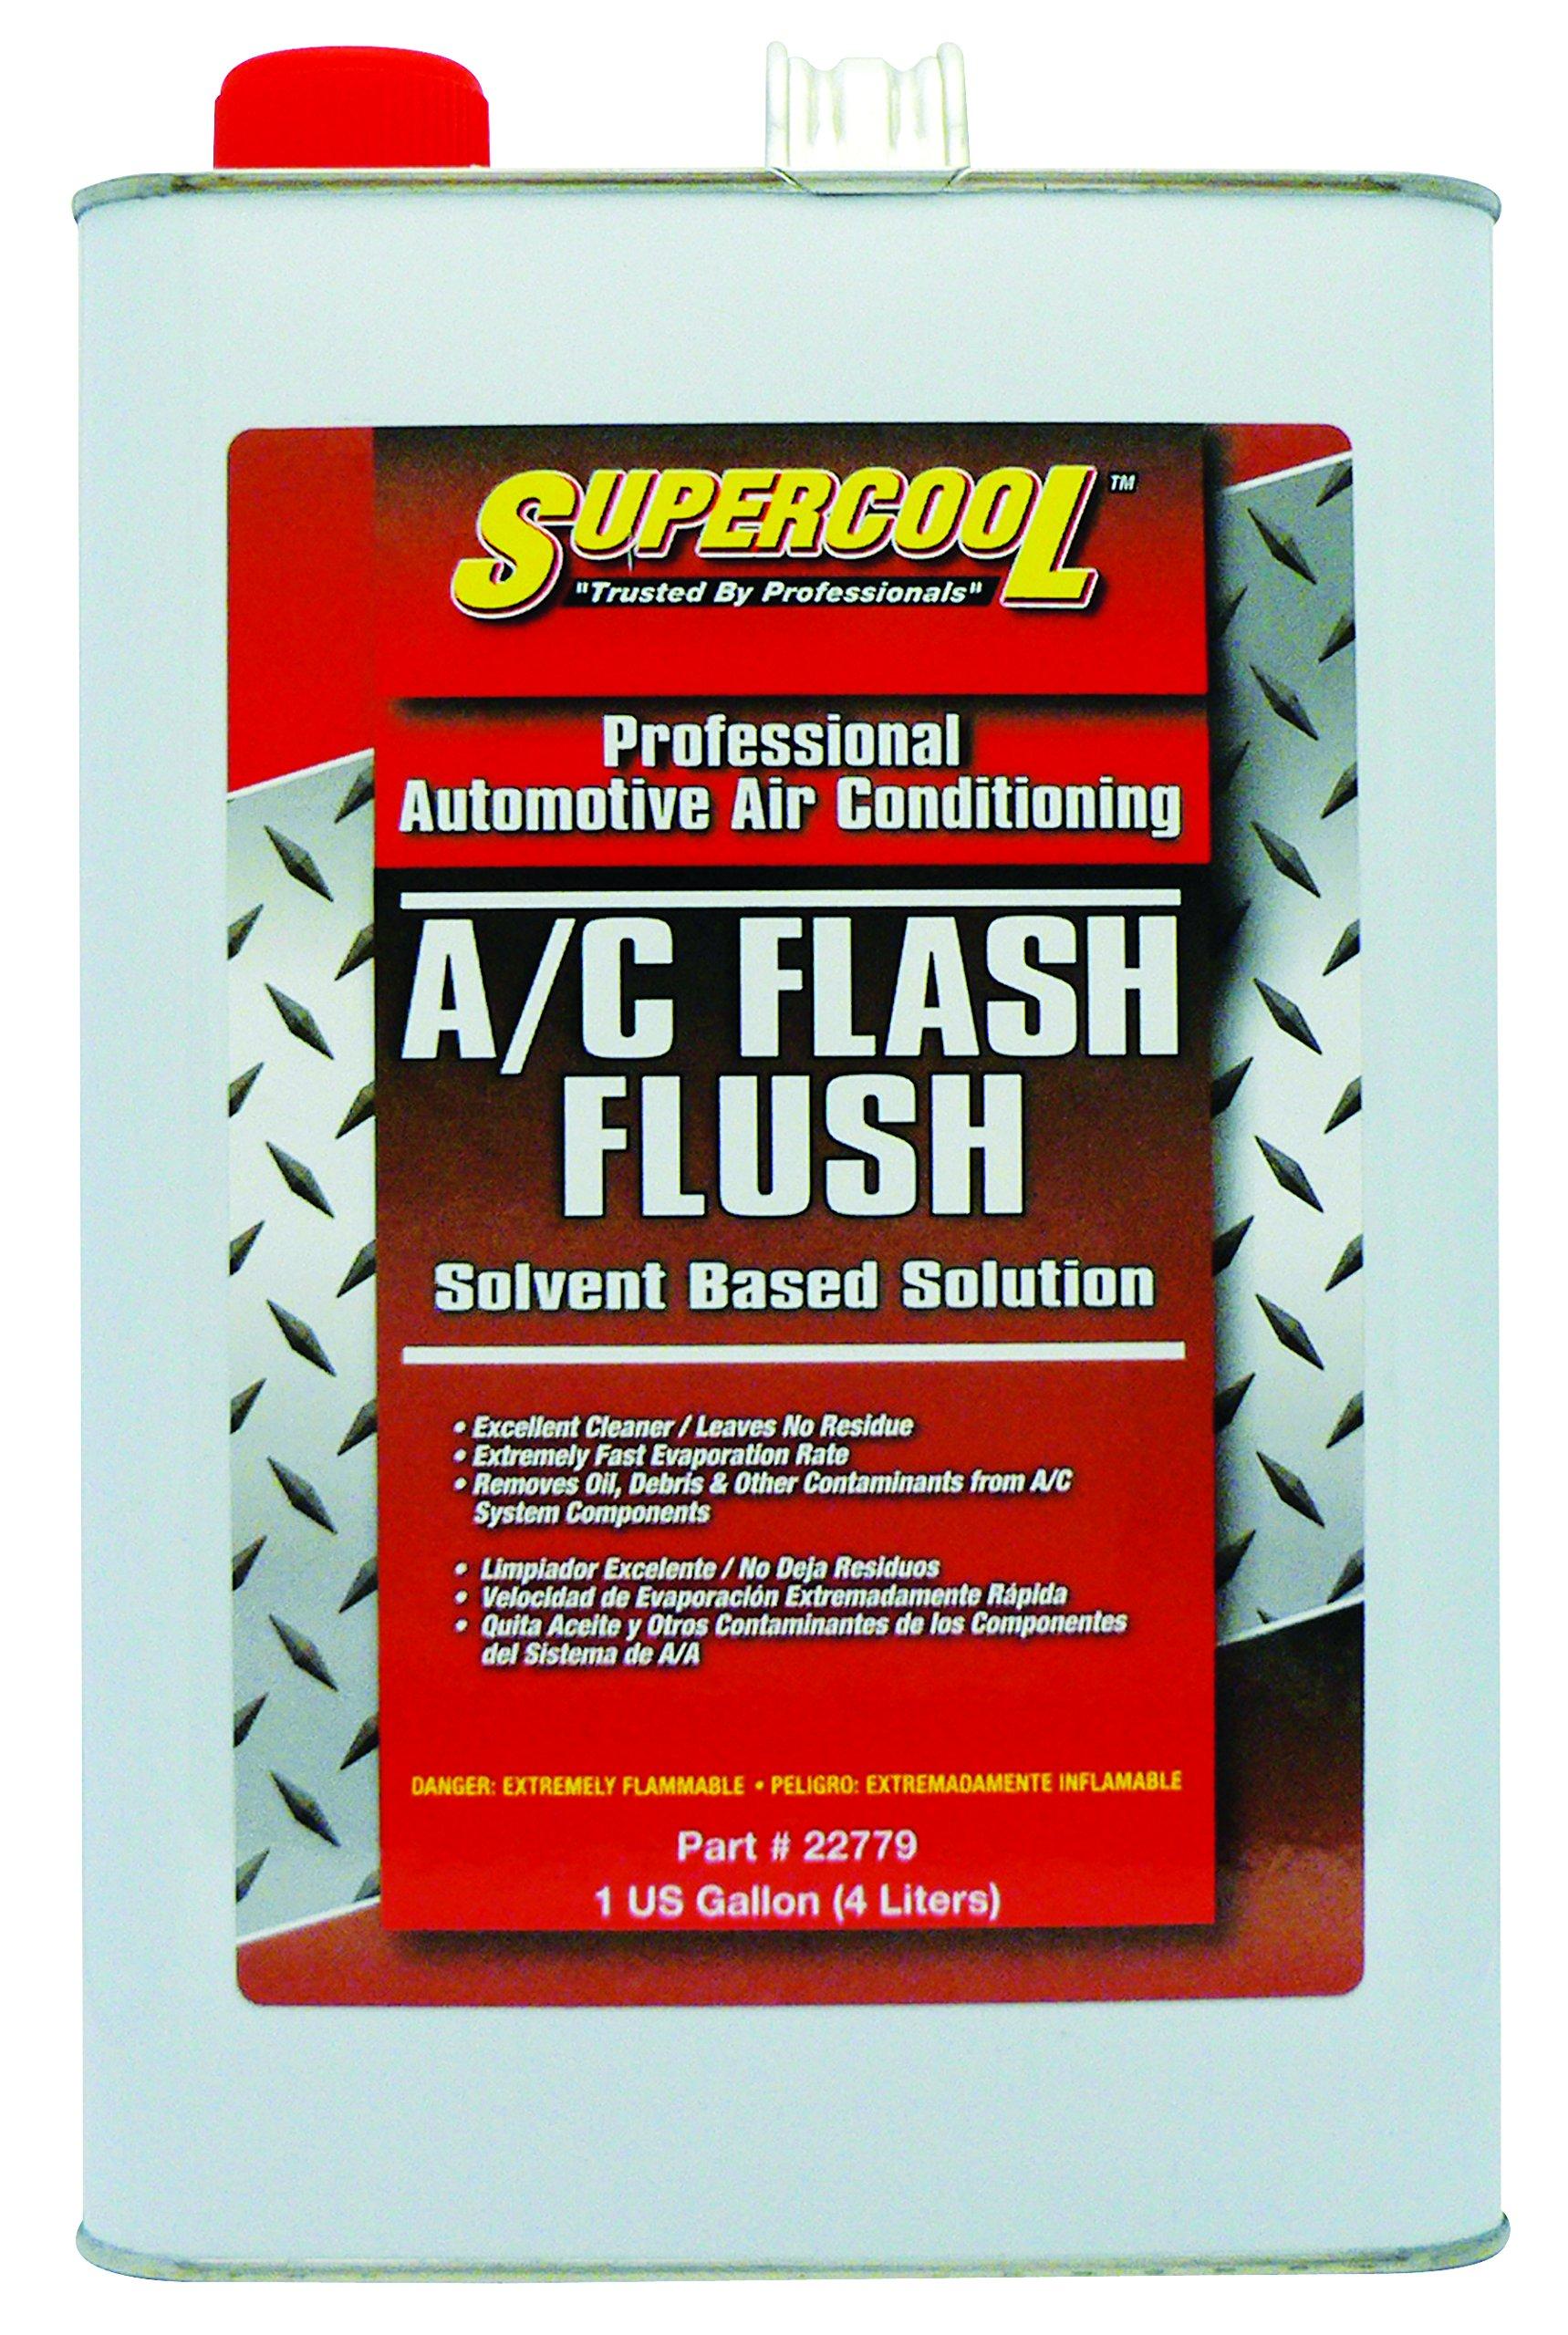 TSI Supercool 22779 Solvent-Based A/C Flush, 1 gallon by TSI Supercool